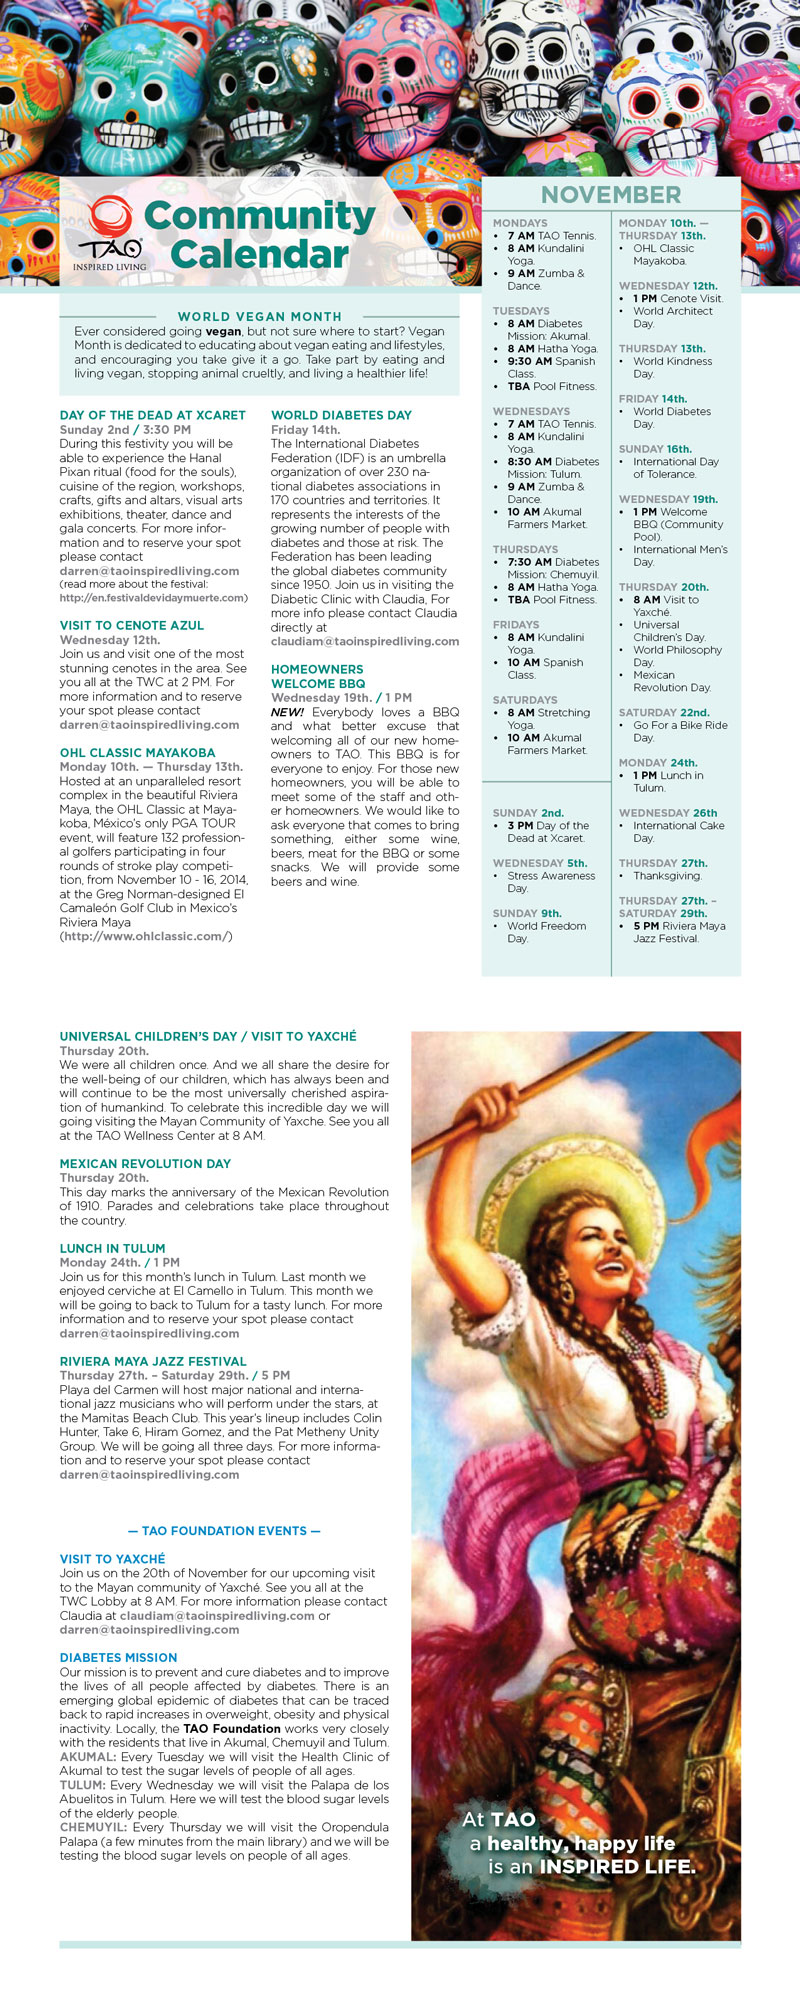 Community Calendar - November 2014